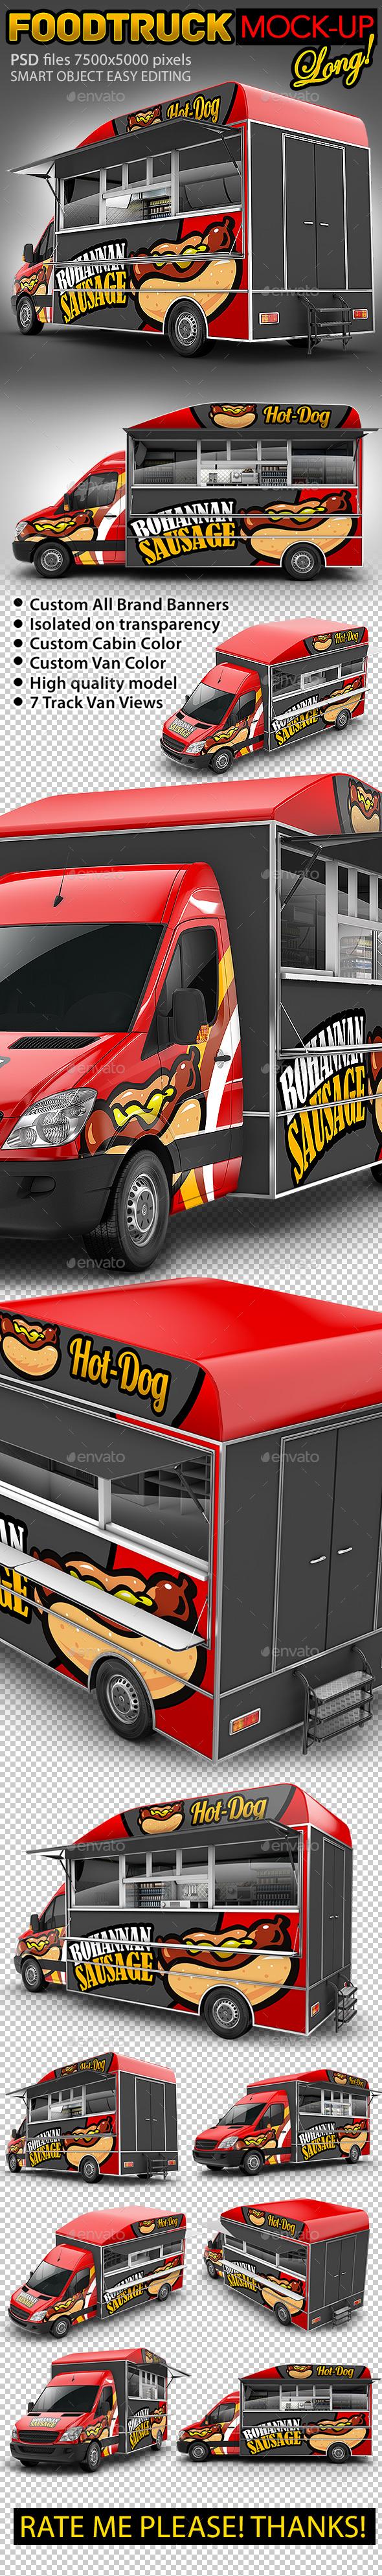 Food Truck Hod-Dog Mock-Up. Van eatery mockup